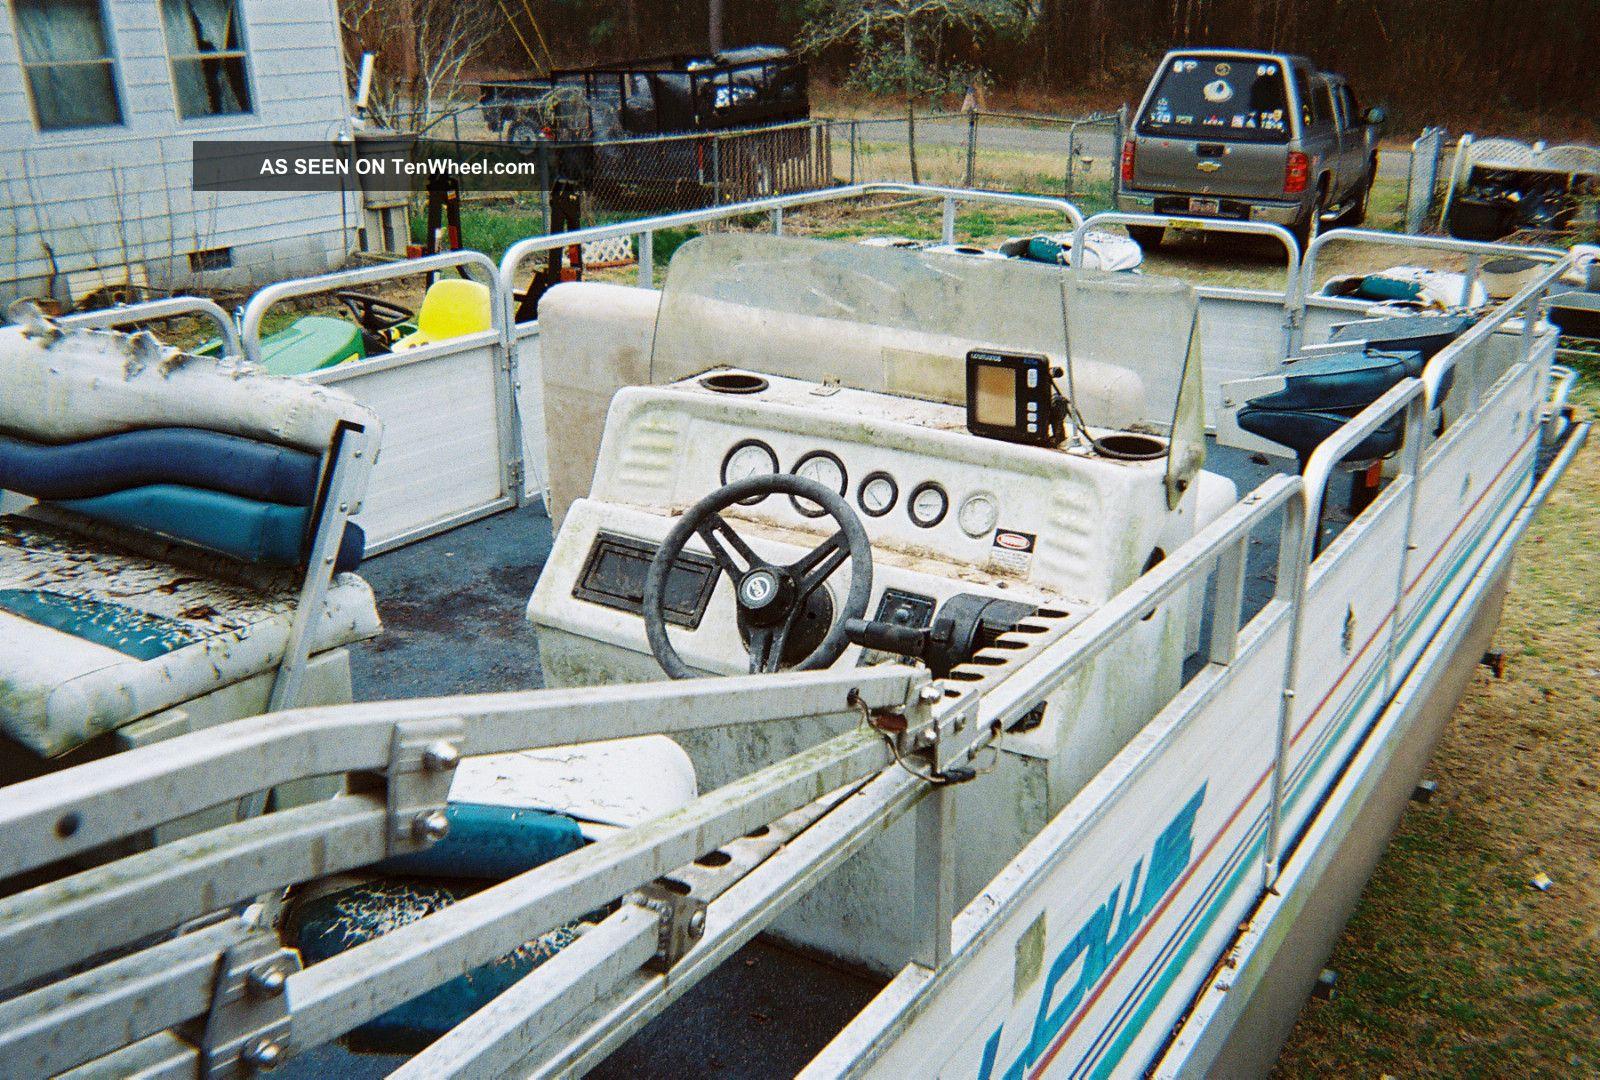 1996 Lowe Boat Image 1 Wiring Diagram 245